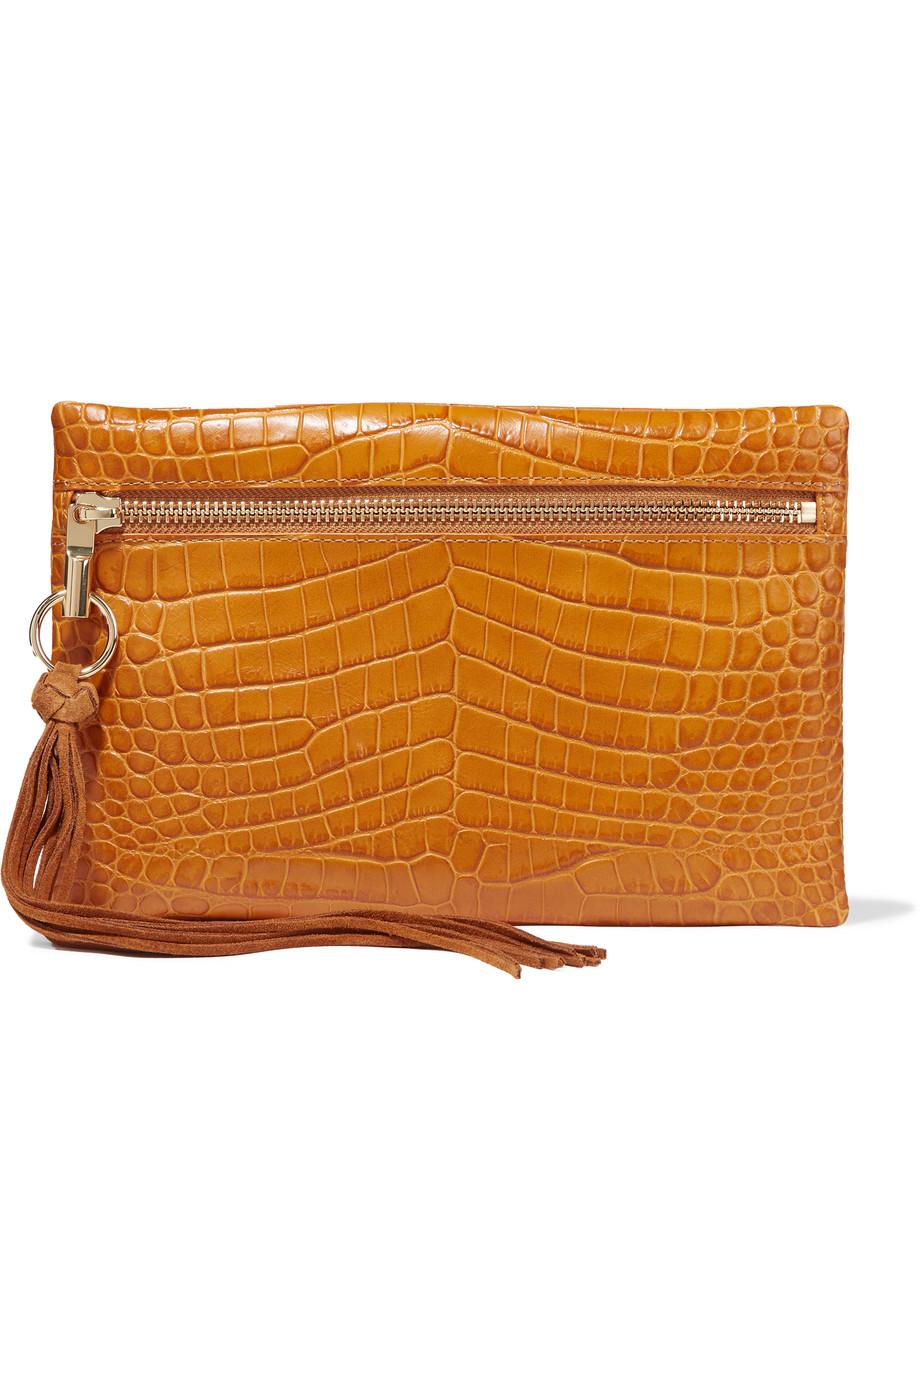 Elizabeth and James Scott Croc-Effect Leather Clutch, Tan, Women's